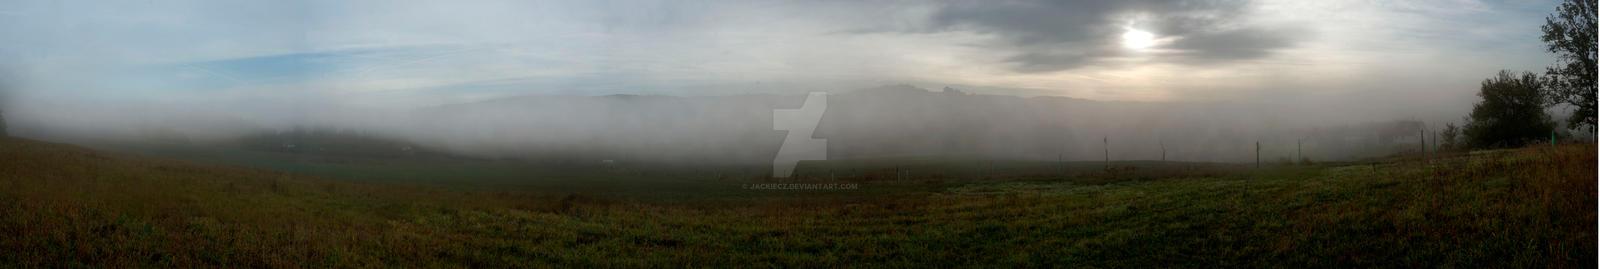 Panorama landscape 001